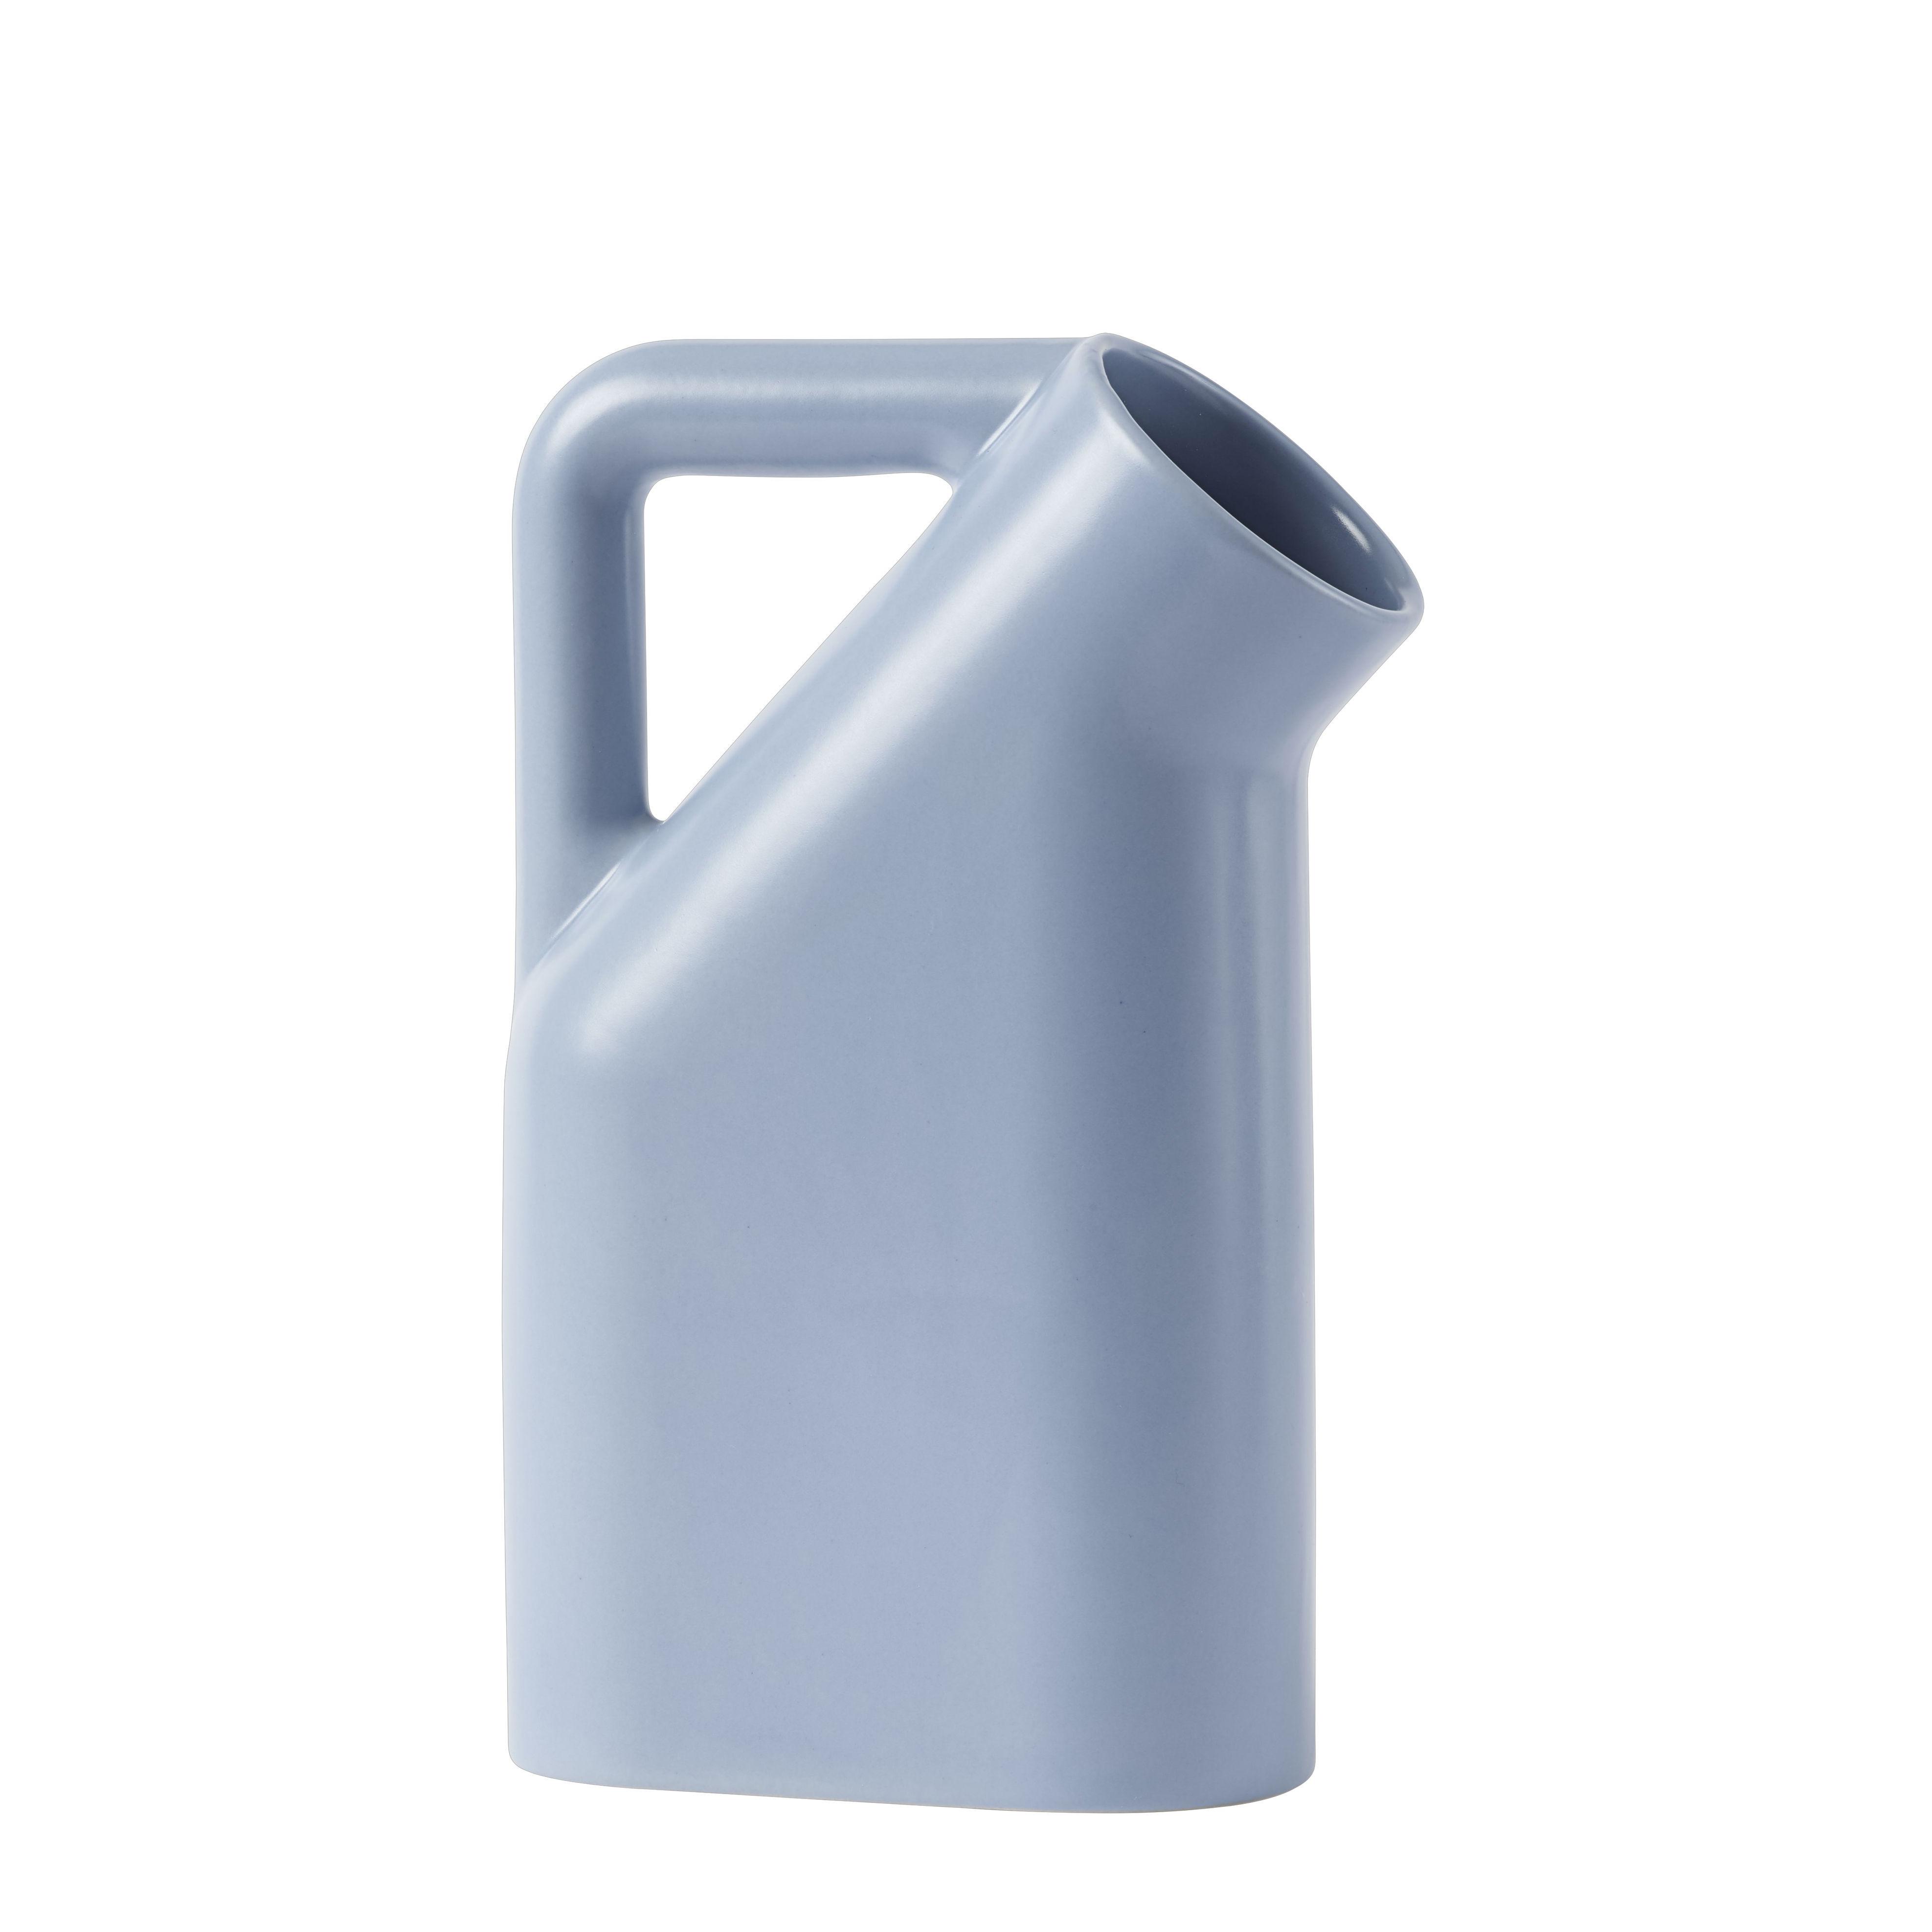 Tableware - Water Carafes & Wine Decanters - Tub Carafe - / Ceramic by Muuto - Pale blue - Enamelled sandstone